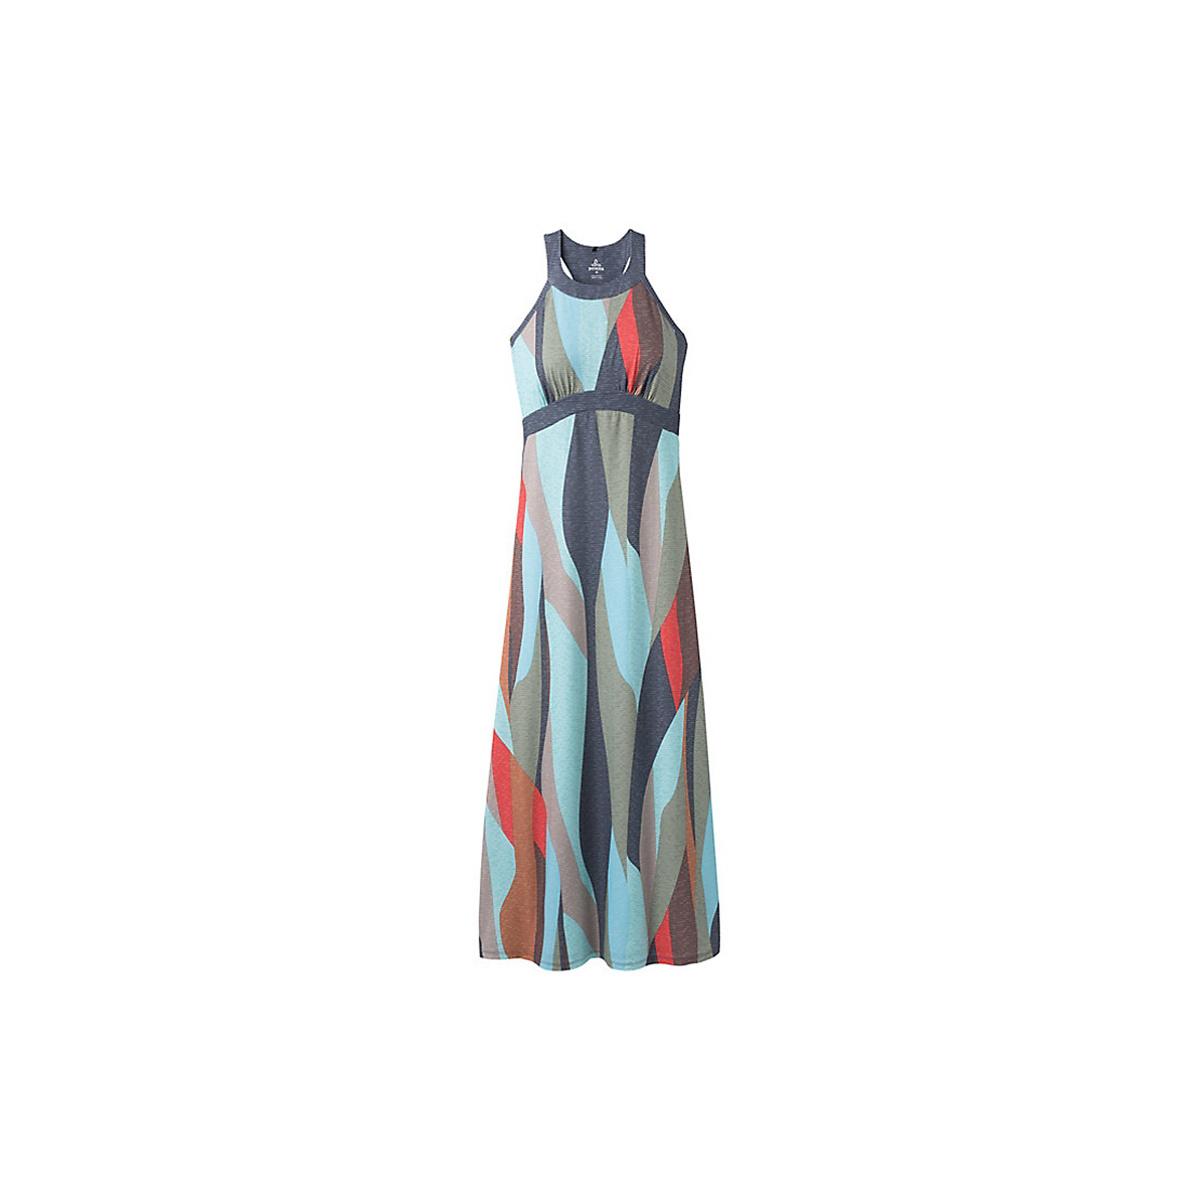 Prana Women's Calexico Maxi Dress